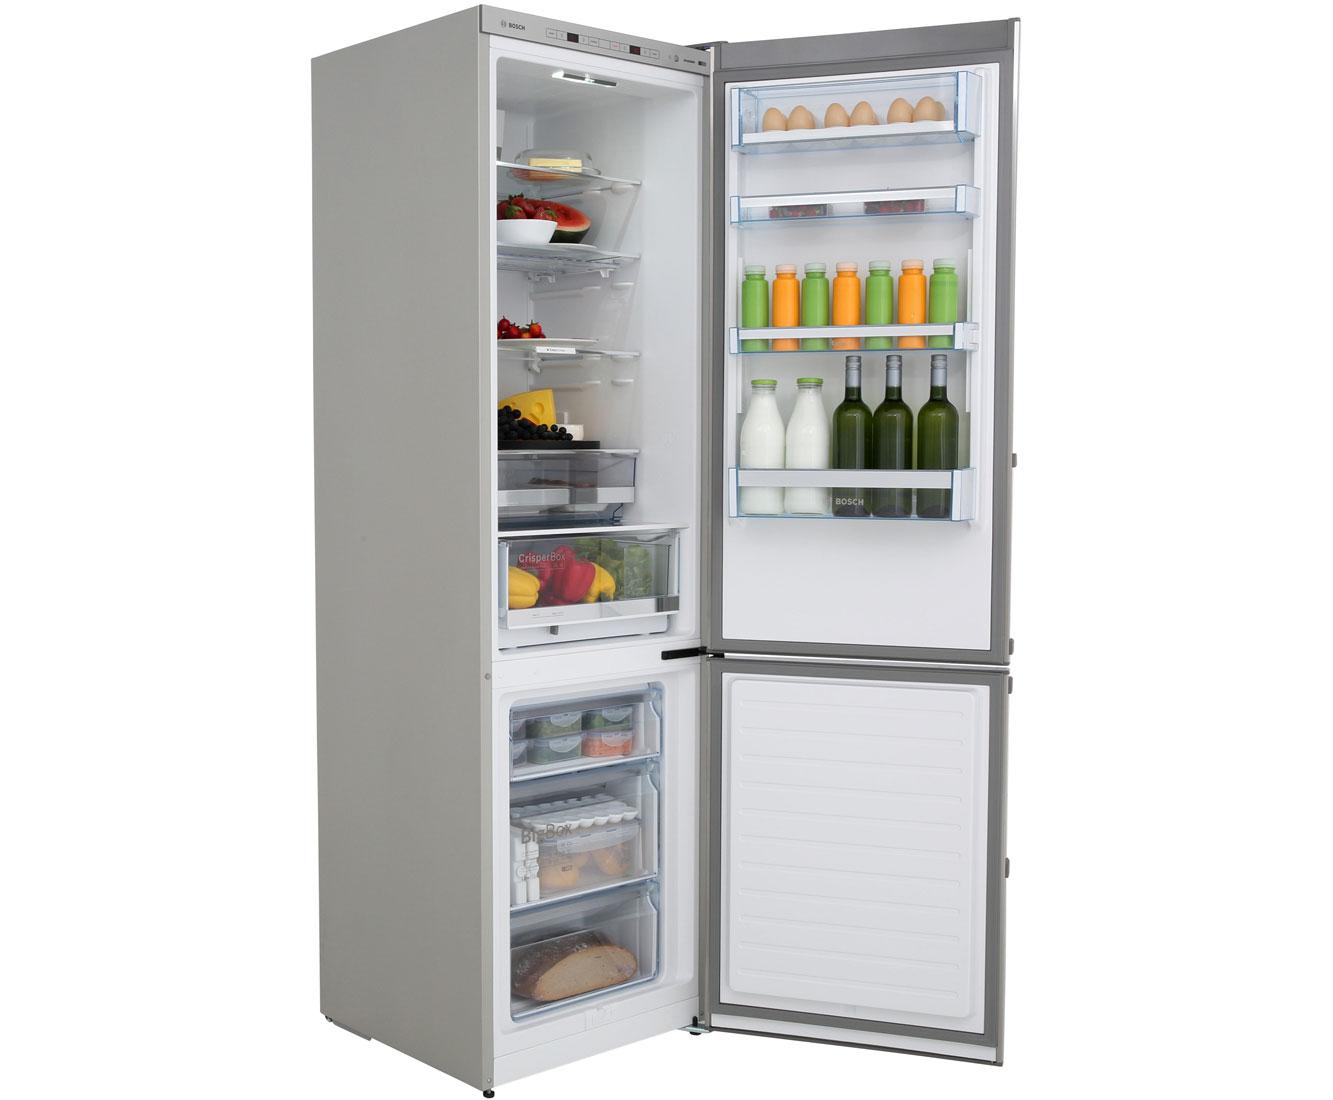 Siemens Kühlschrank Gemüsefach : Asser unter dem gemüsefach smsrayuan